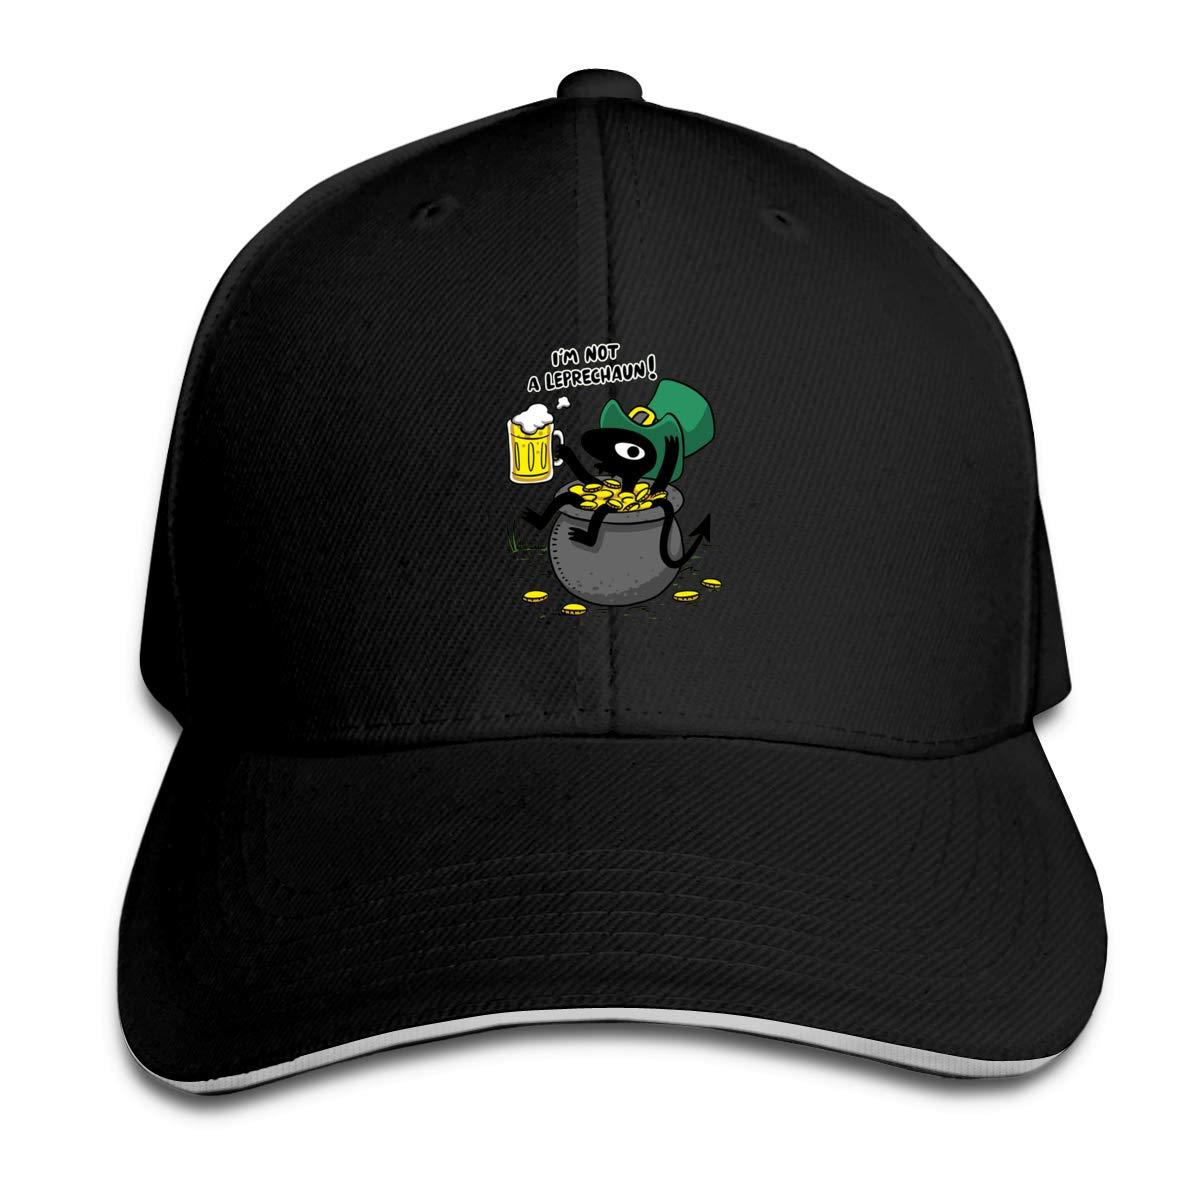 Im Not A Leprechaun Classic Adjustable Cotton Baseball Caps Trucker Driver Hat Outdoor Cap Black